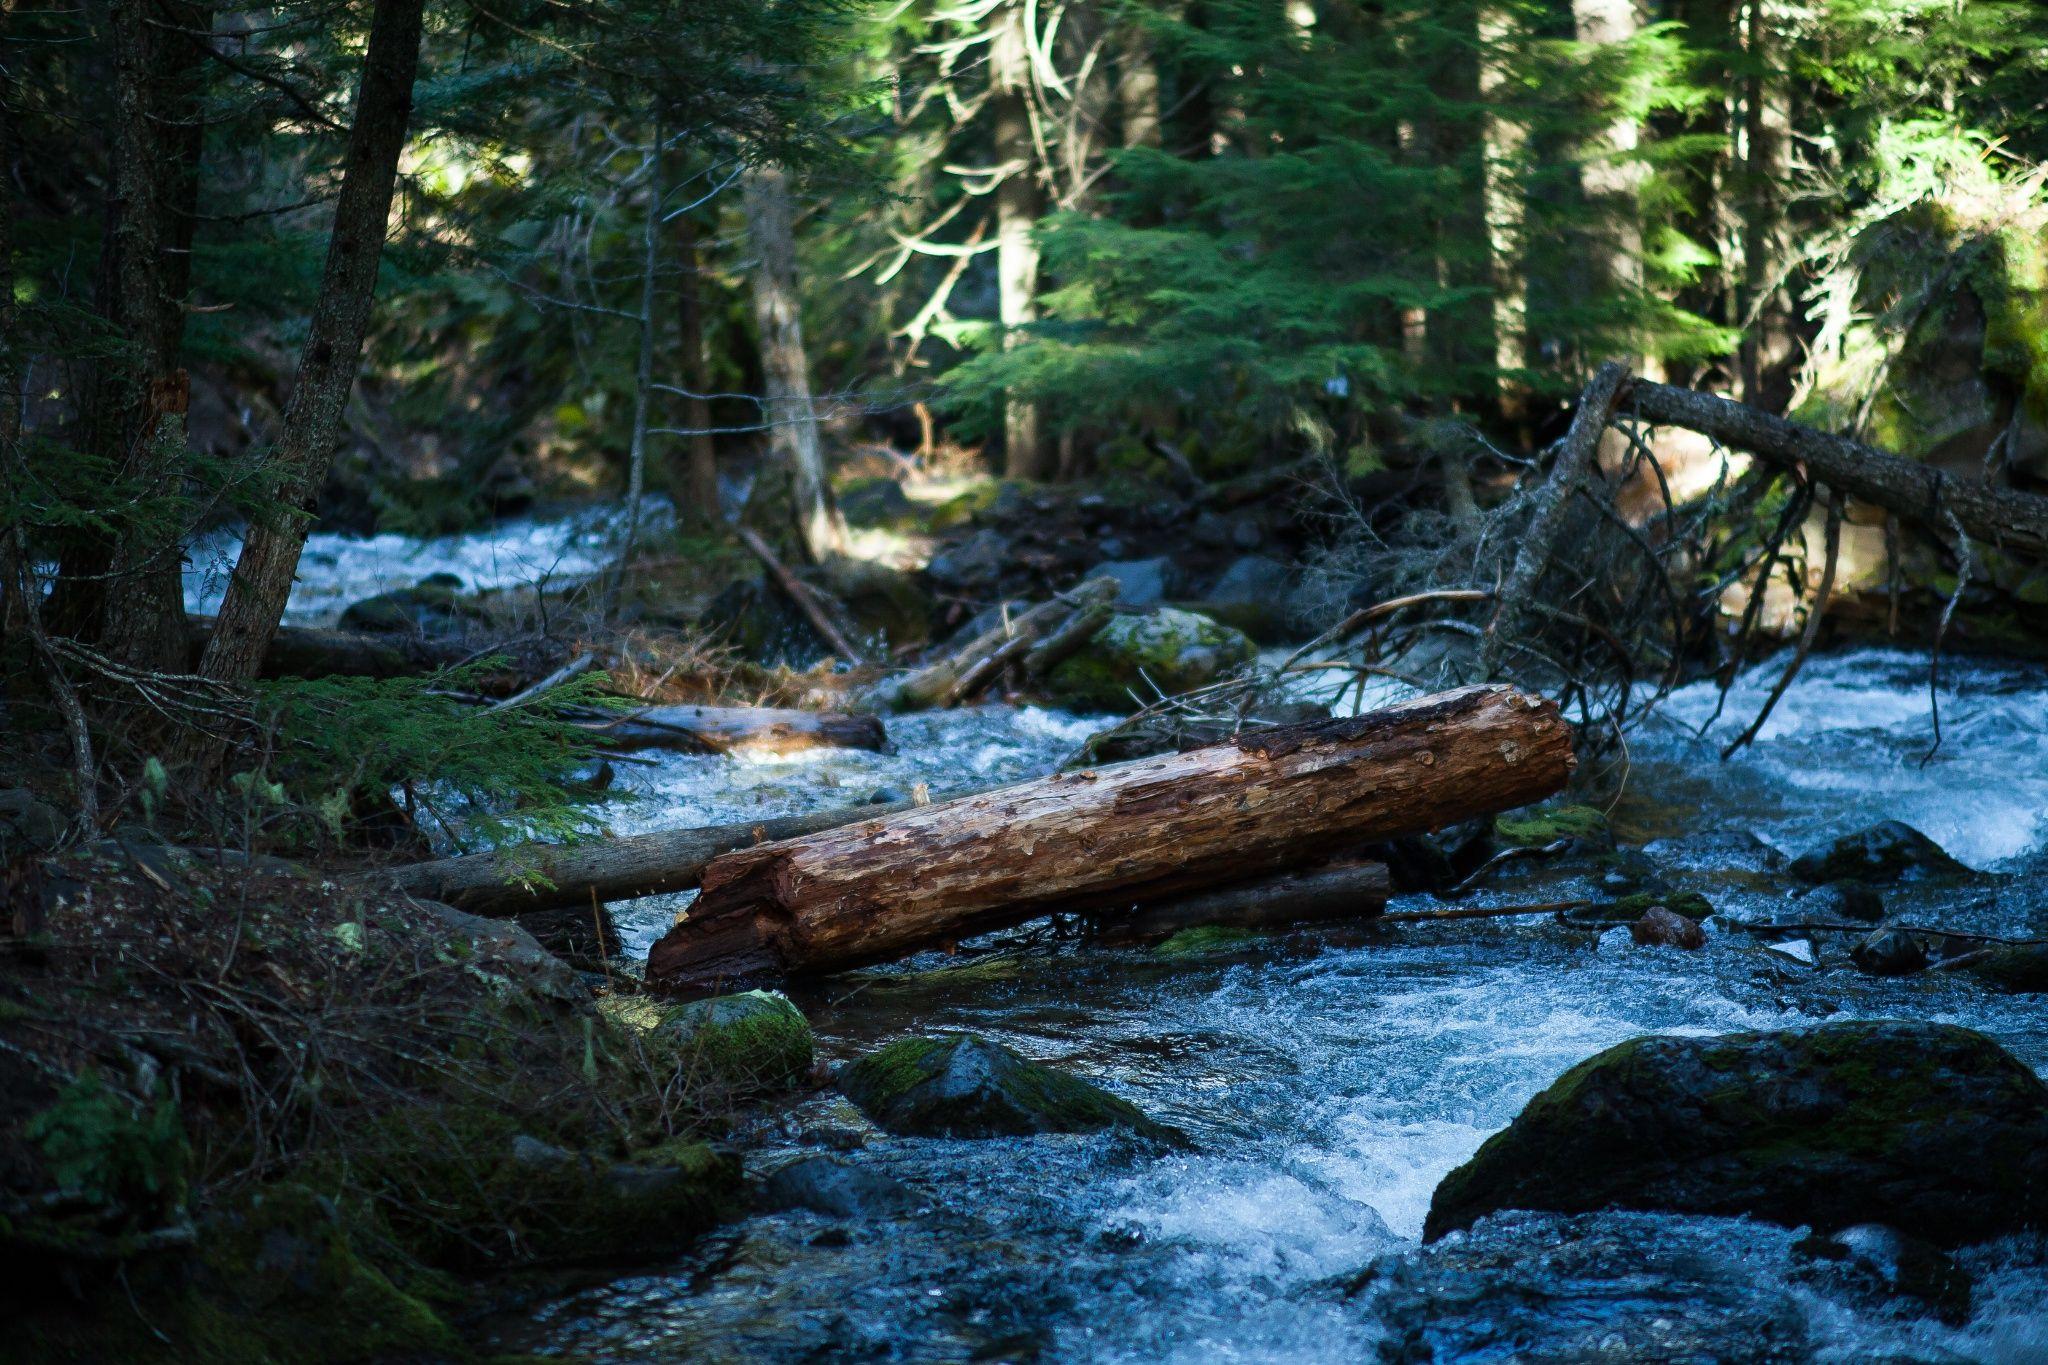 Photograph Creek by Tim Mezen on 500px